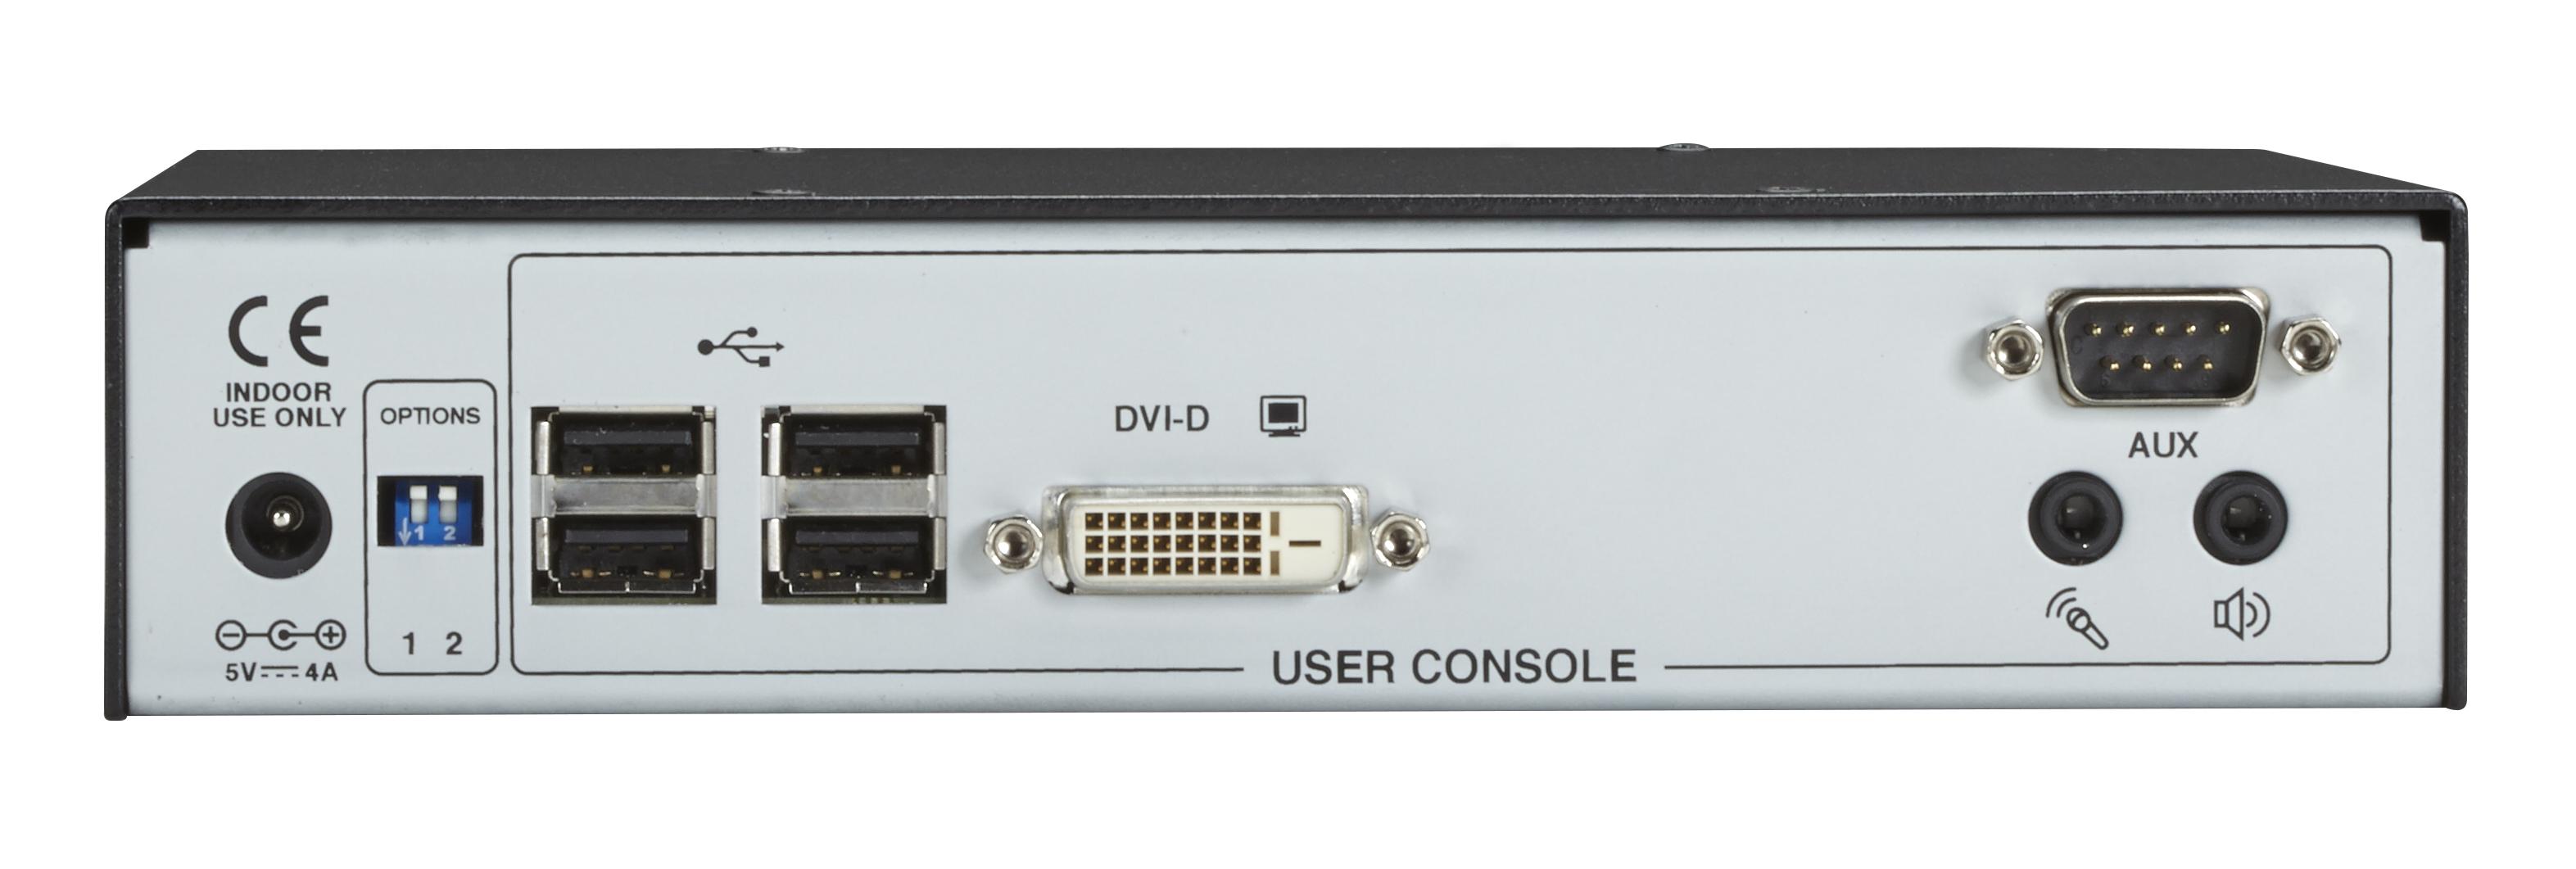 Agility KVM Over IP Matrix Receiver, DVI-D, USB 2 0 | Black Box